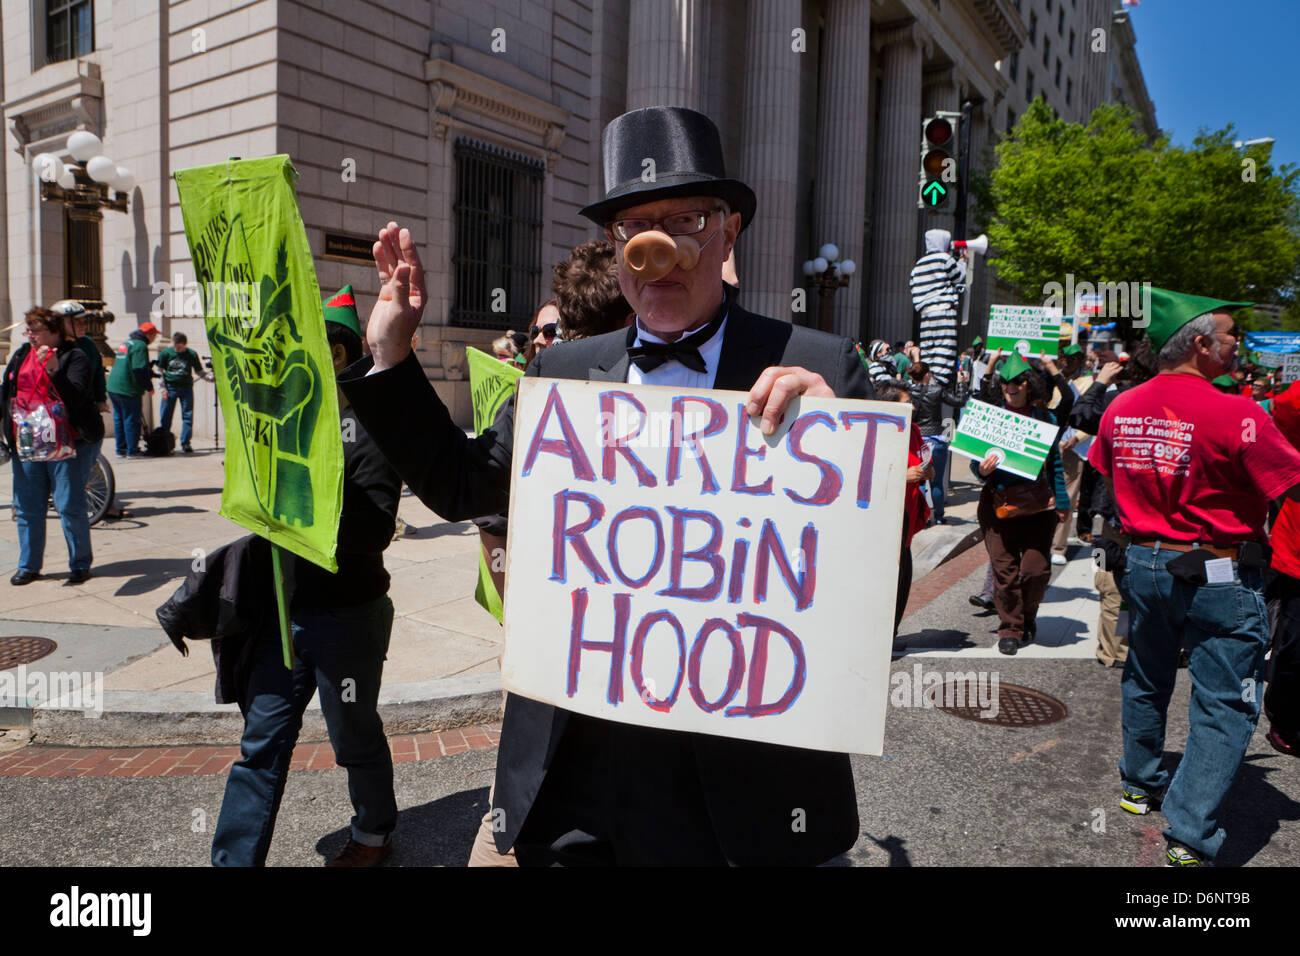 Robin-Hood-Steuer Anhänger Rallye - Washington, DC USA Stockbild